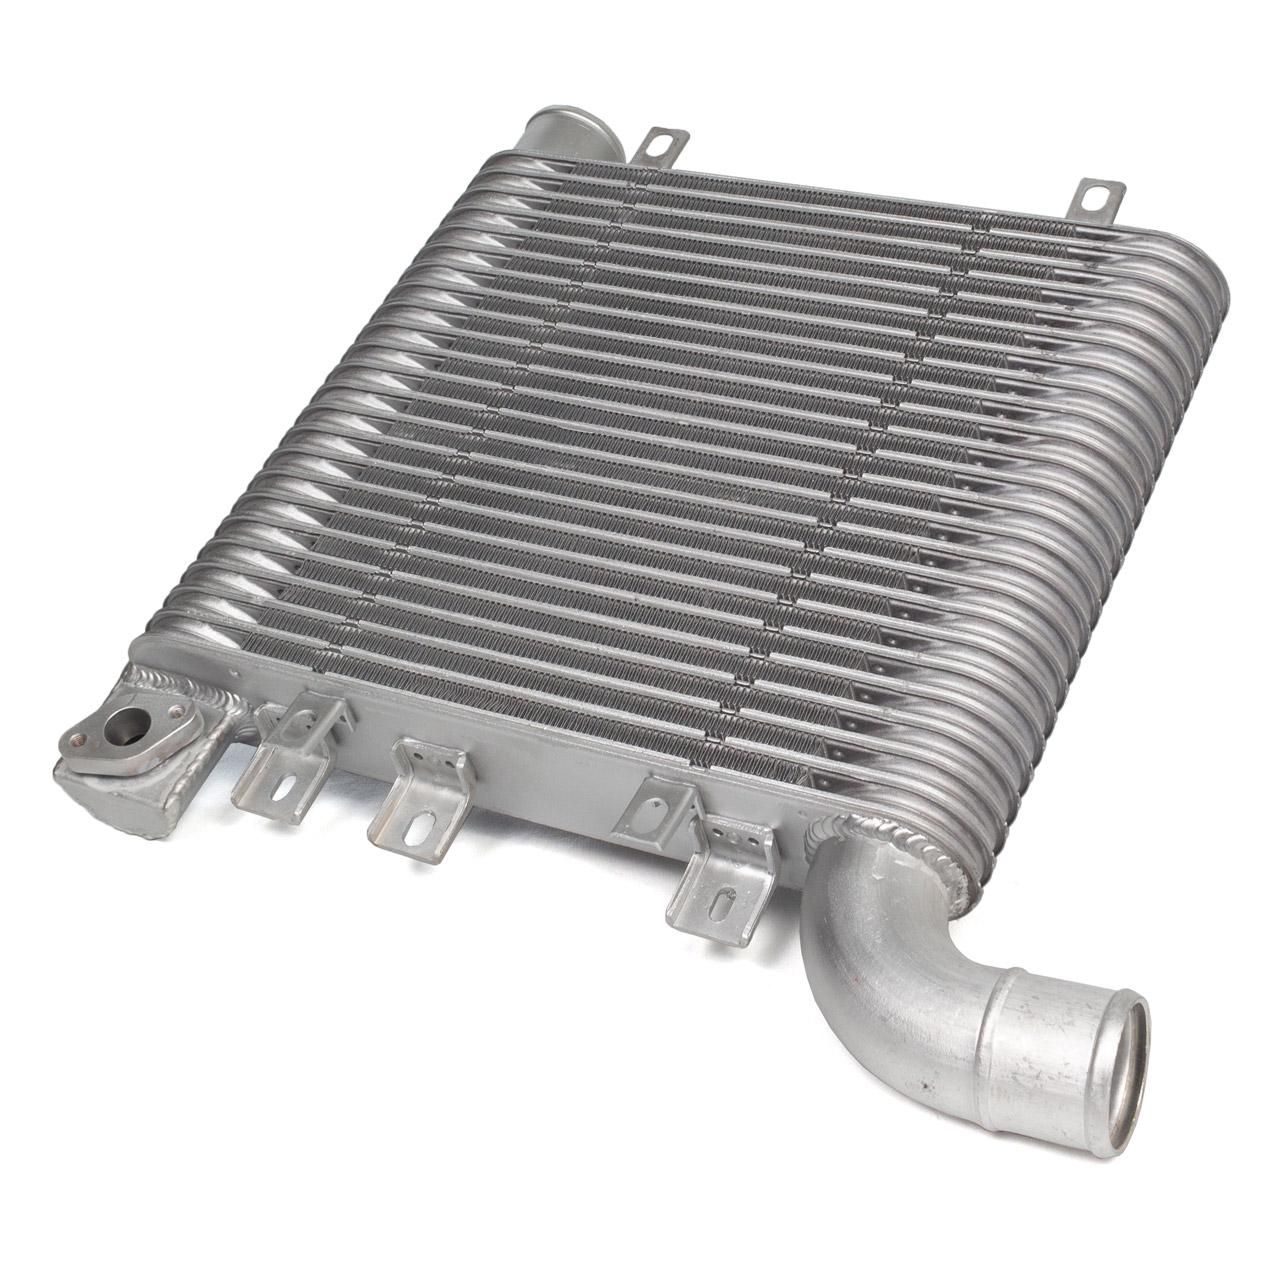 NRF 30331 Ladeluftkühler Turbokühler HYUNDAI Santa Fe 2 2.2 CRDi 2827127800